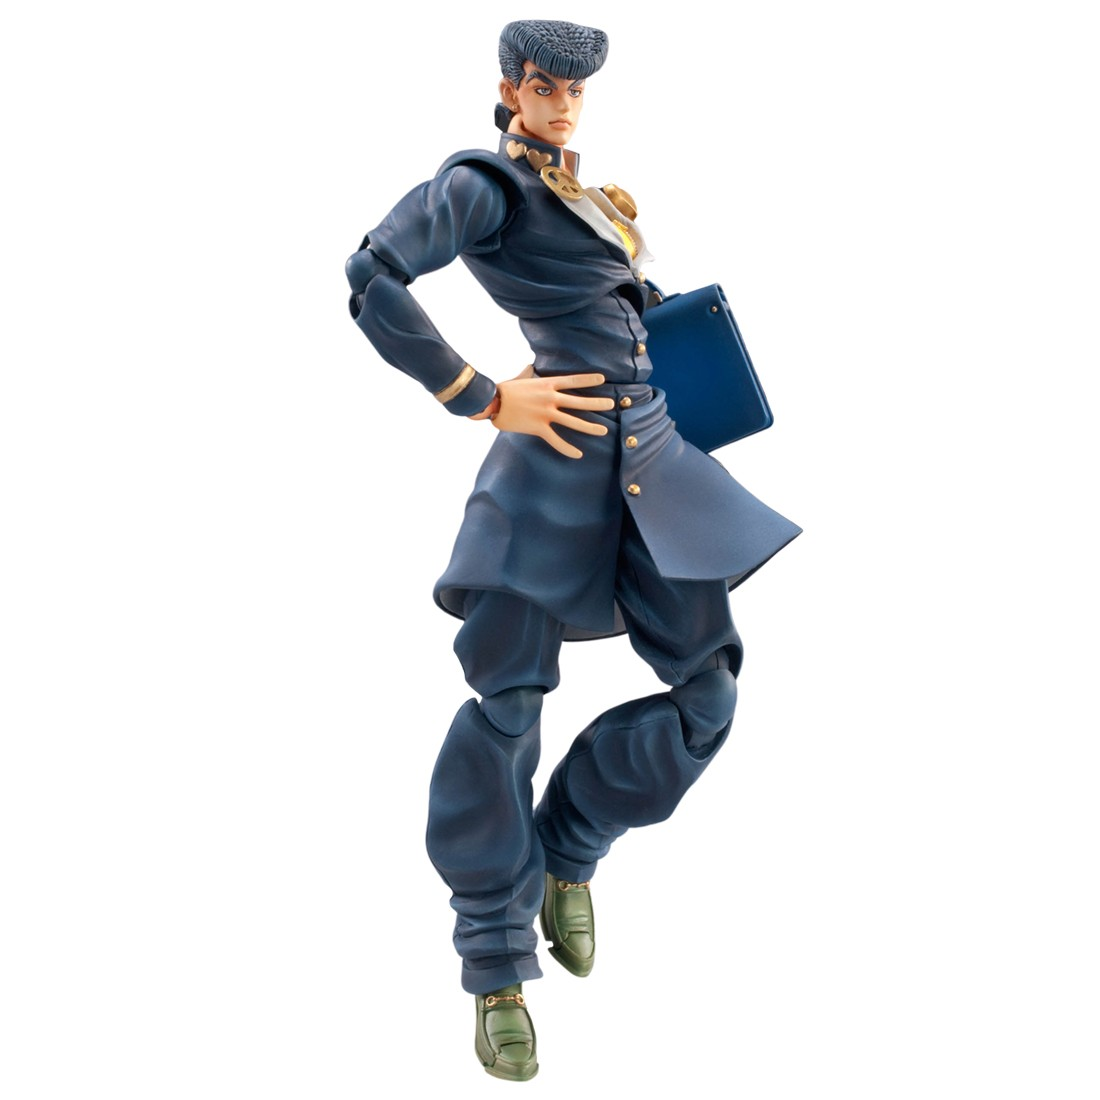 Medicos Super Action Statue JoJo's Bizarre Adventure Part 4 Diamond Is Unbreakable Josuke Higashikata Chozokado Figure Re-Run (blue)